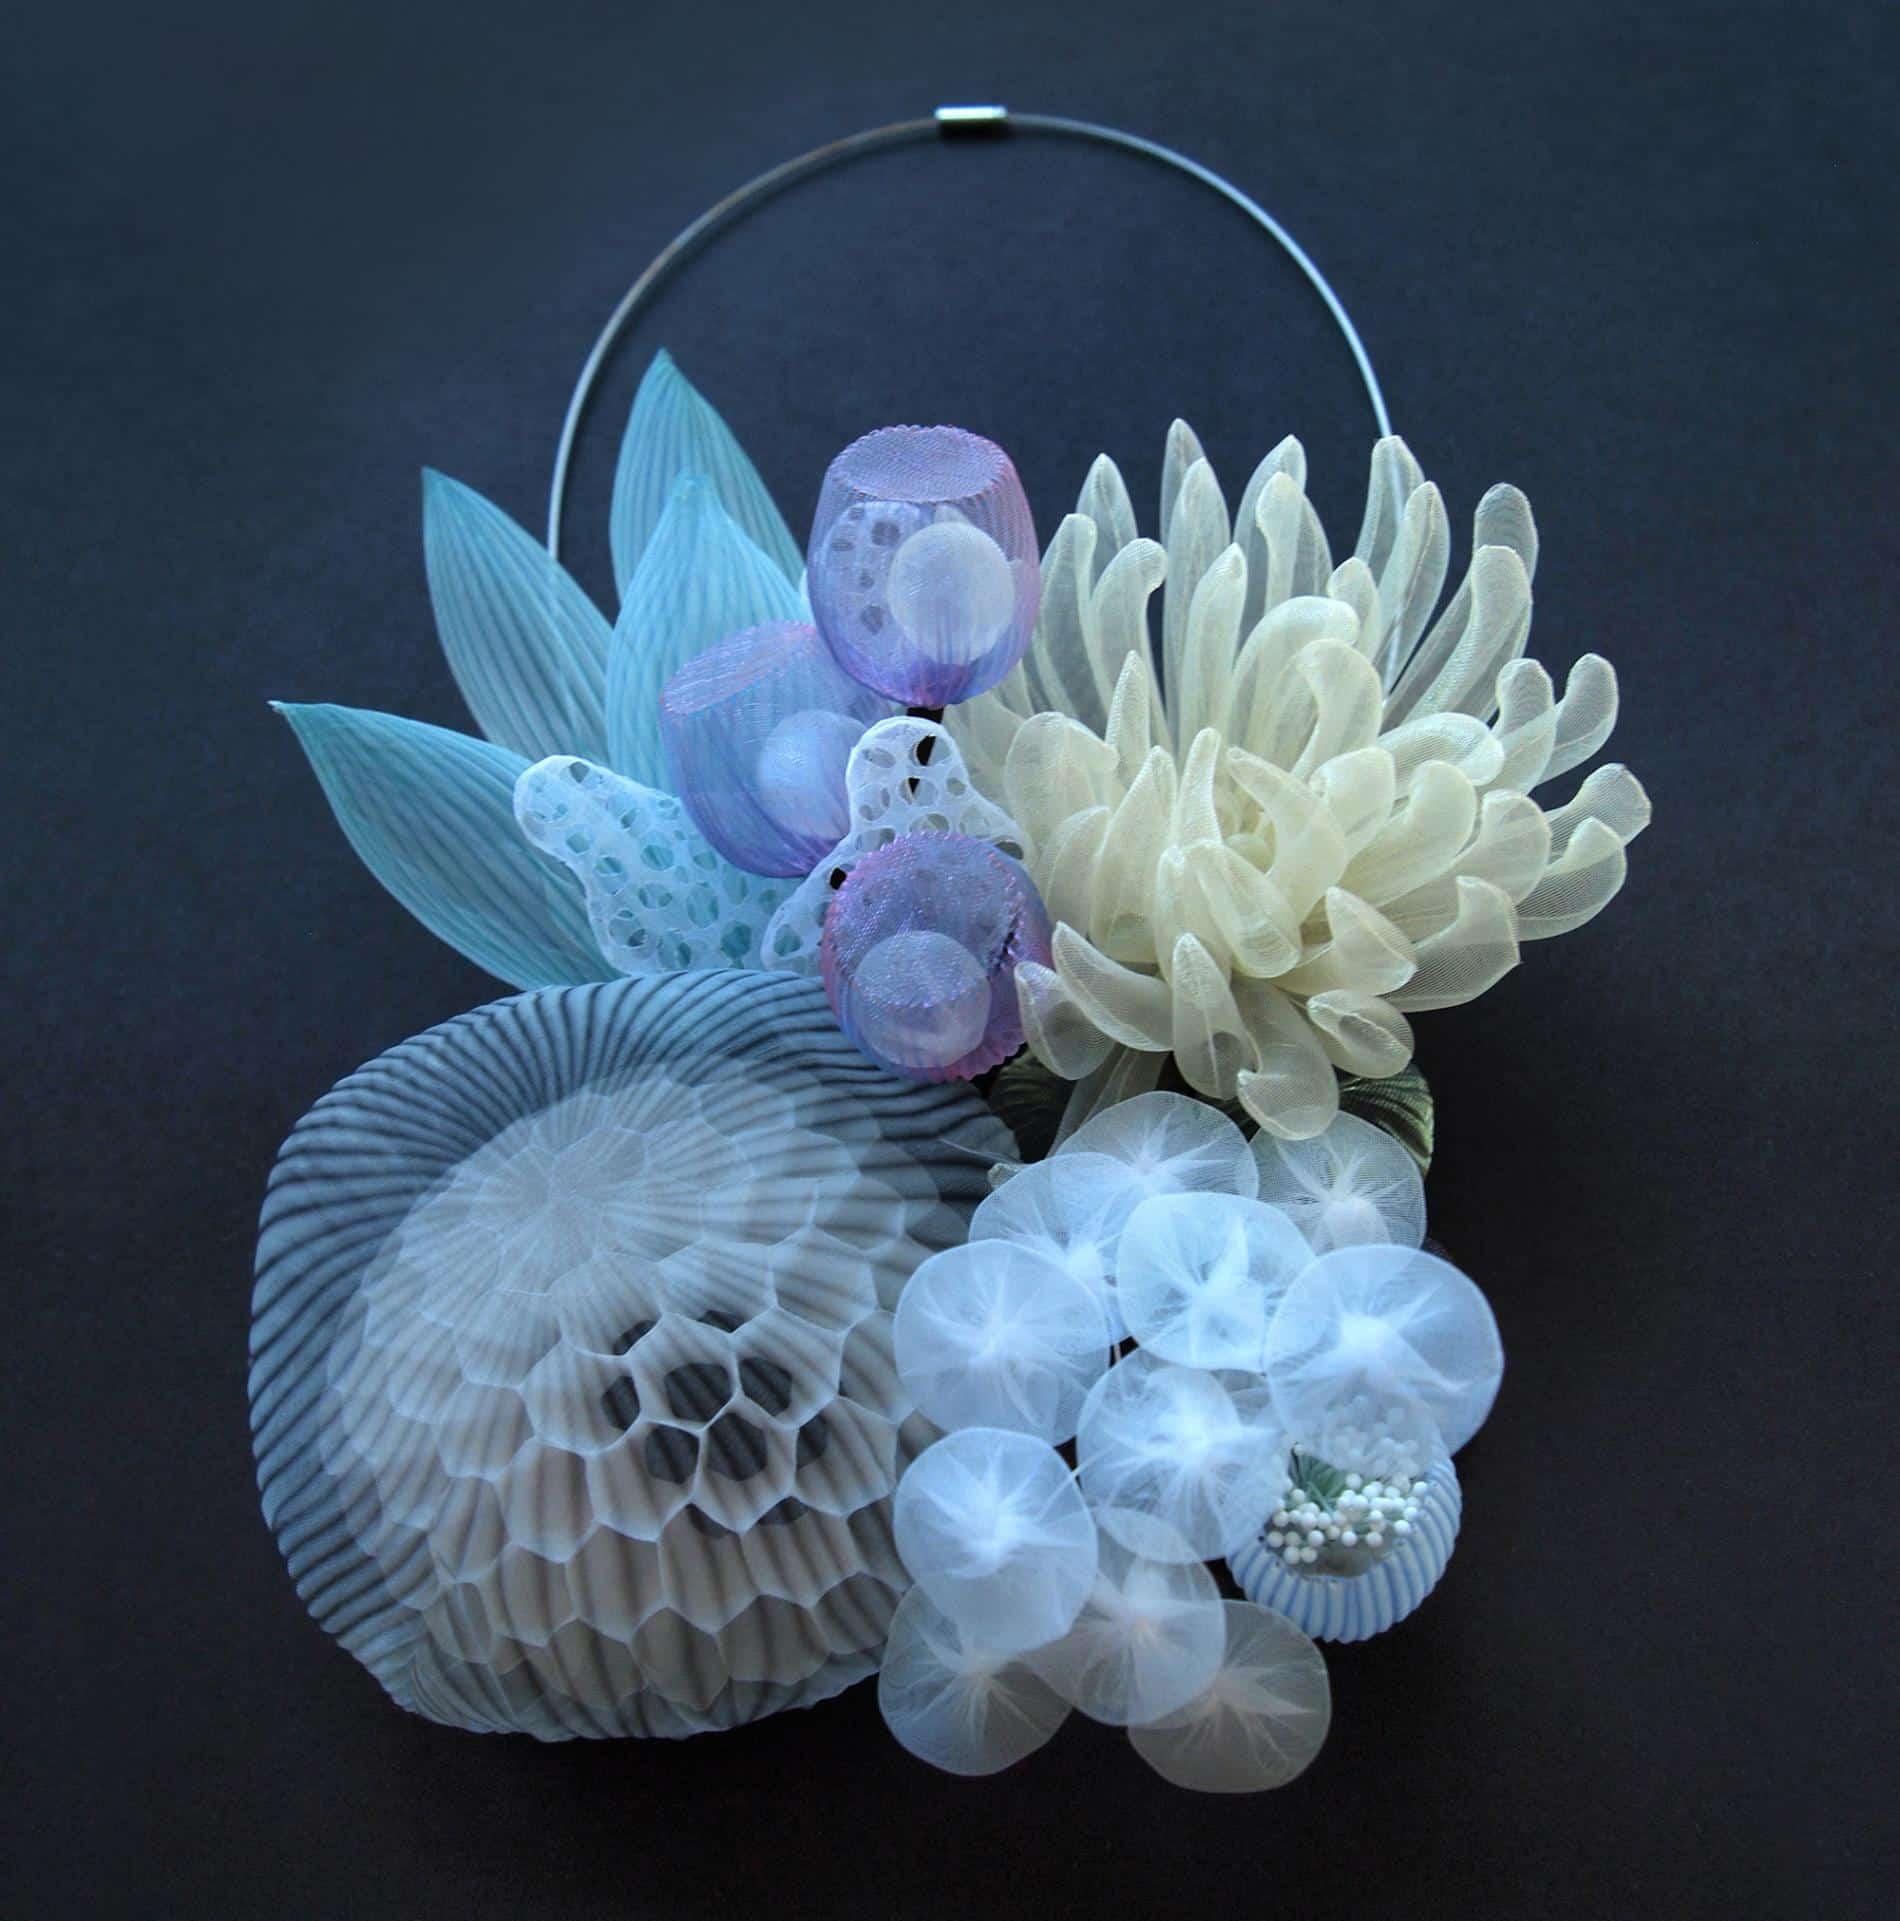 kusumoto textiles traslucidos accesorios